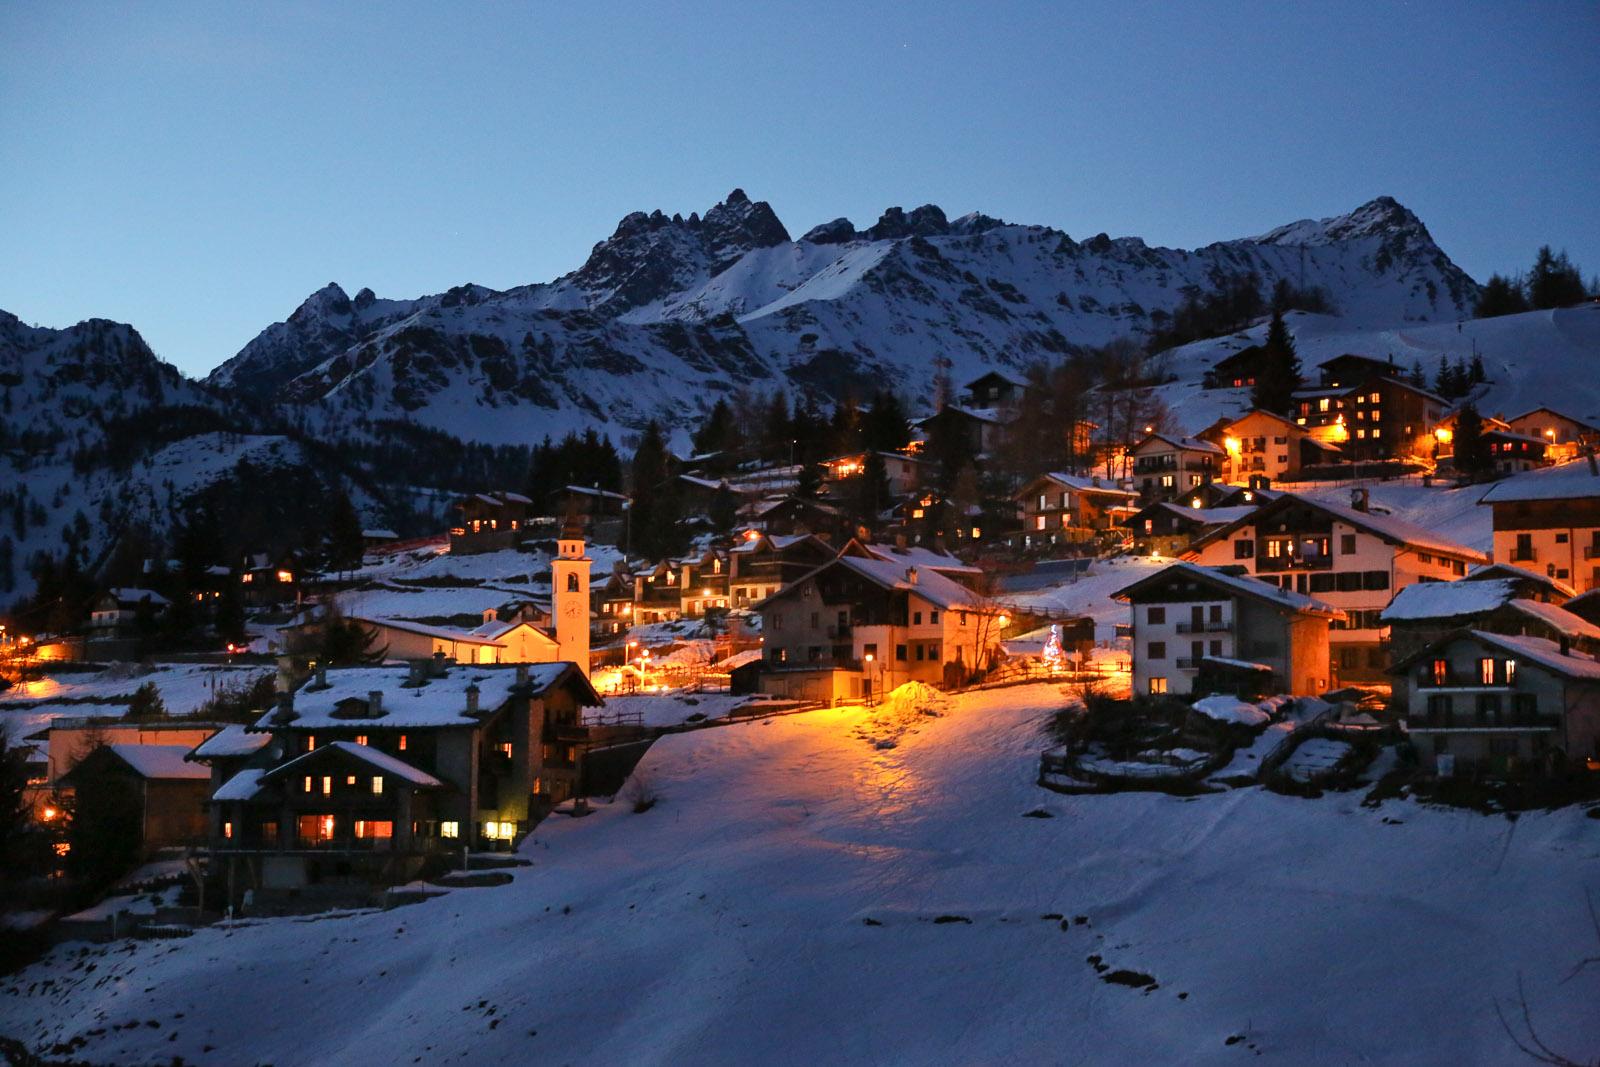 The little village of Chamois, Valle d'Aosta, Italy